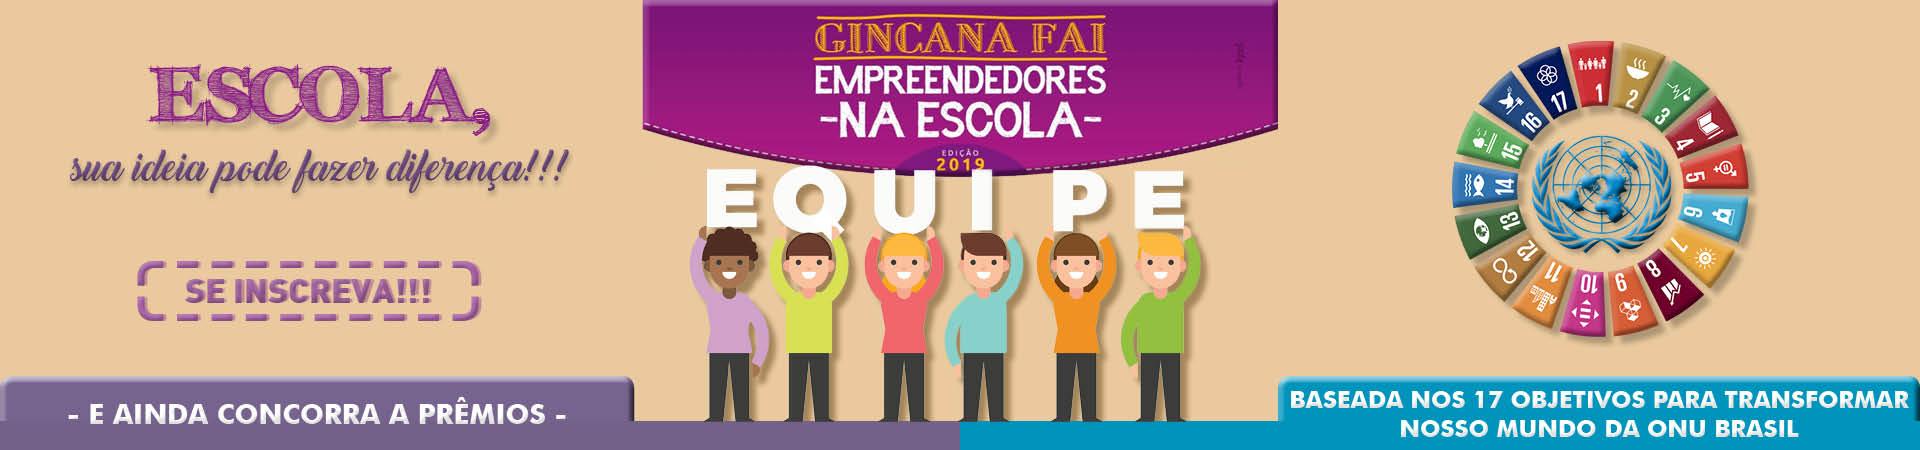 Gincana-Equipe-banner-19-08-2019